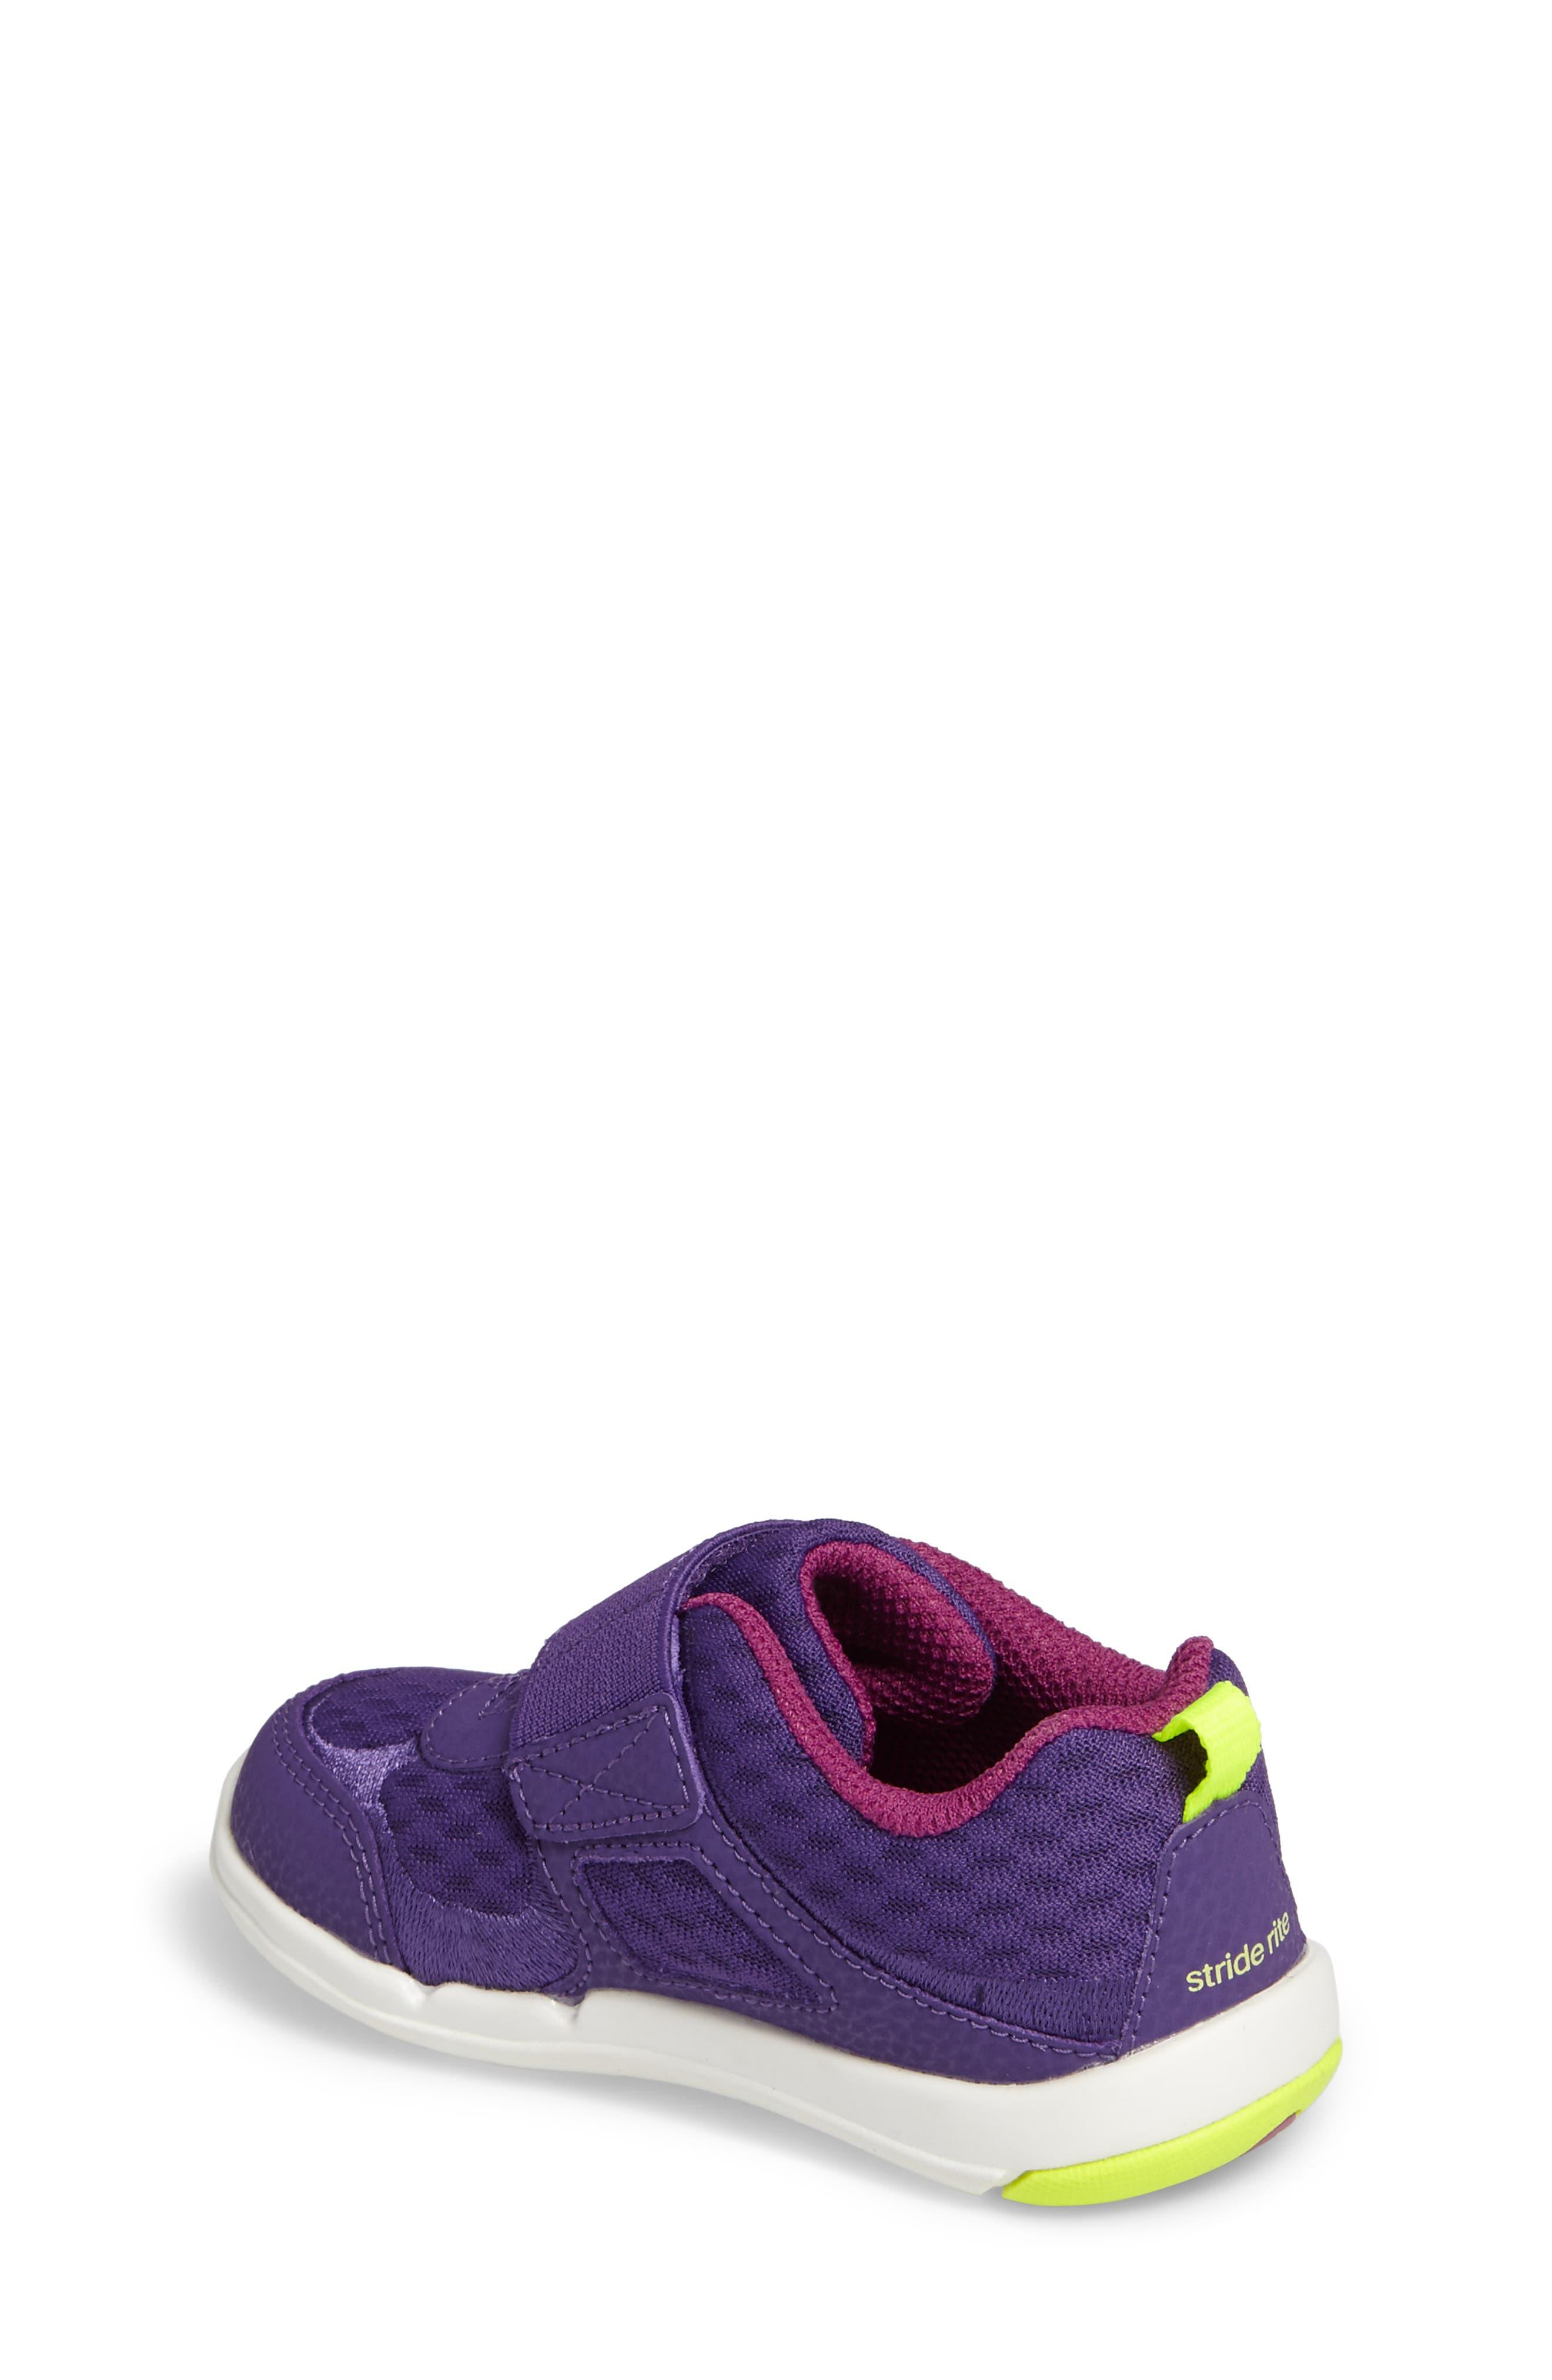 Casey Sneaker,                             Alternate thumbnail 2, color,                             Purple